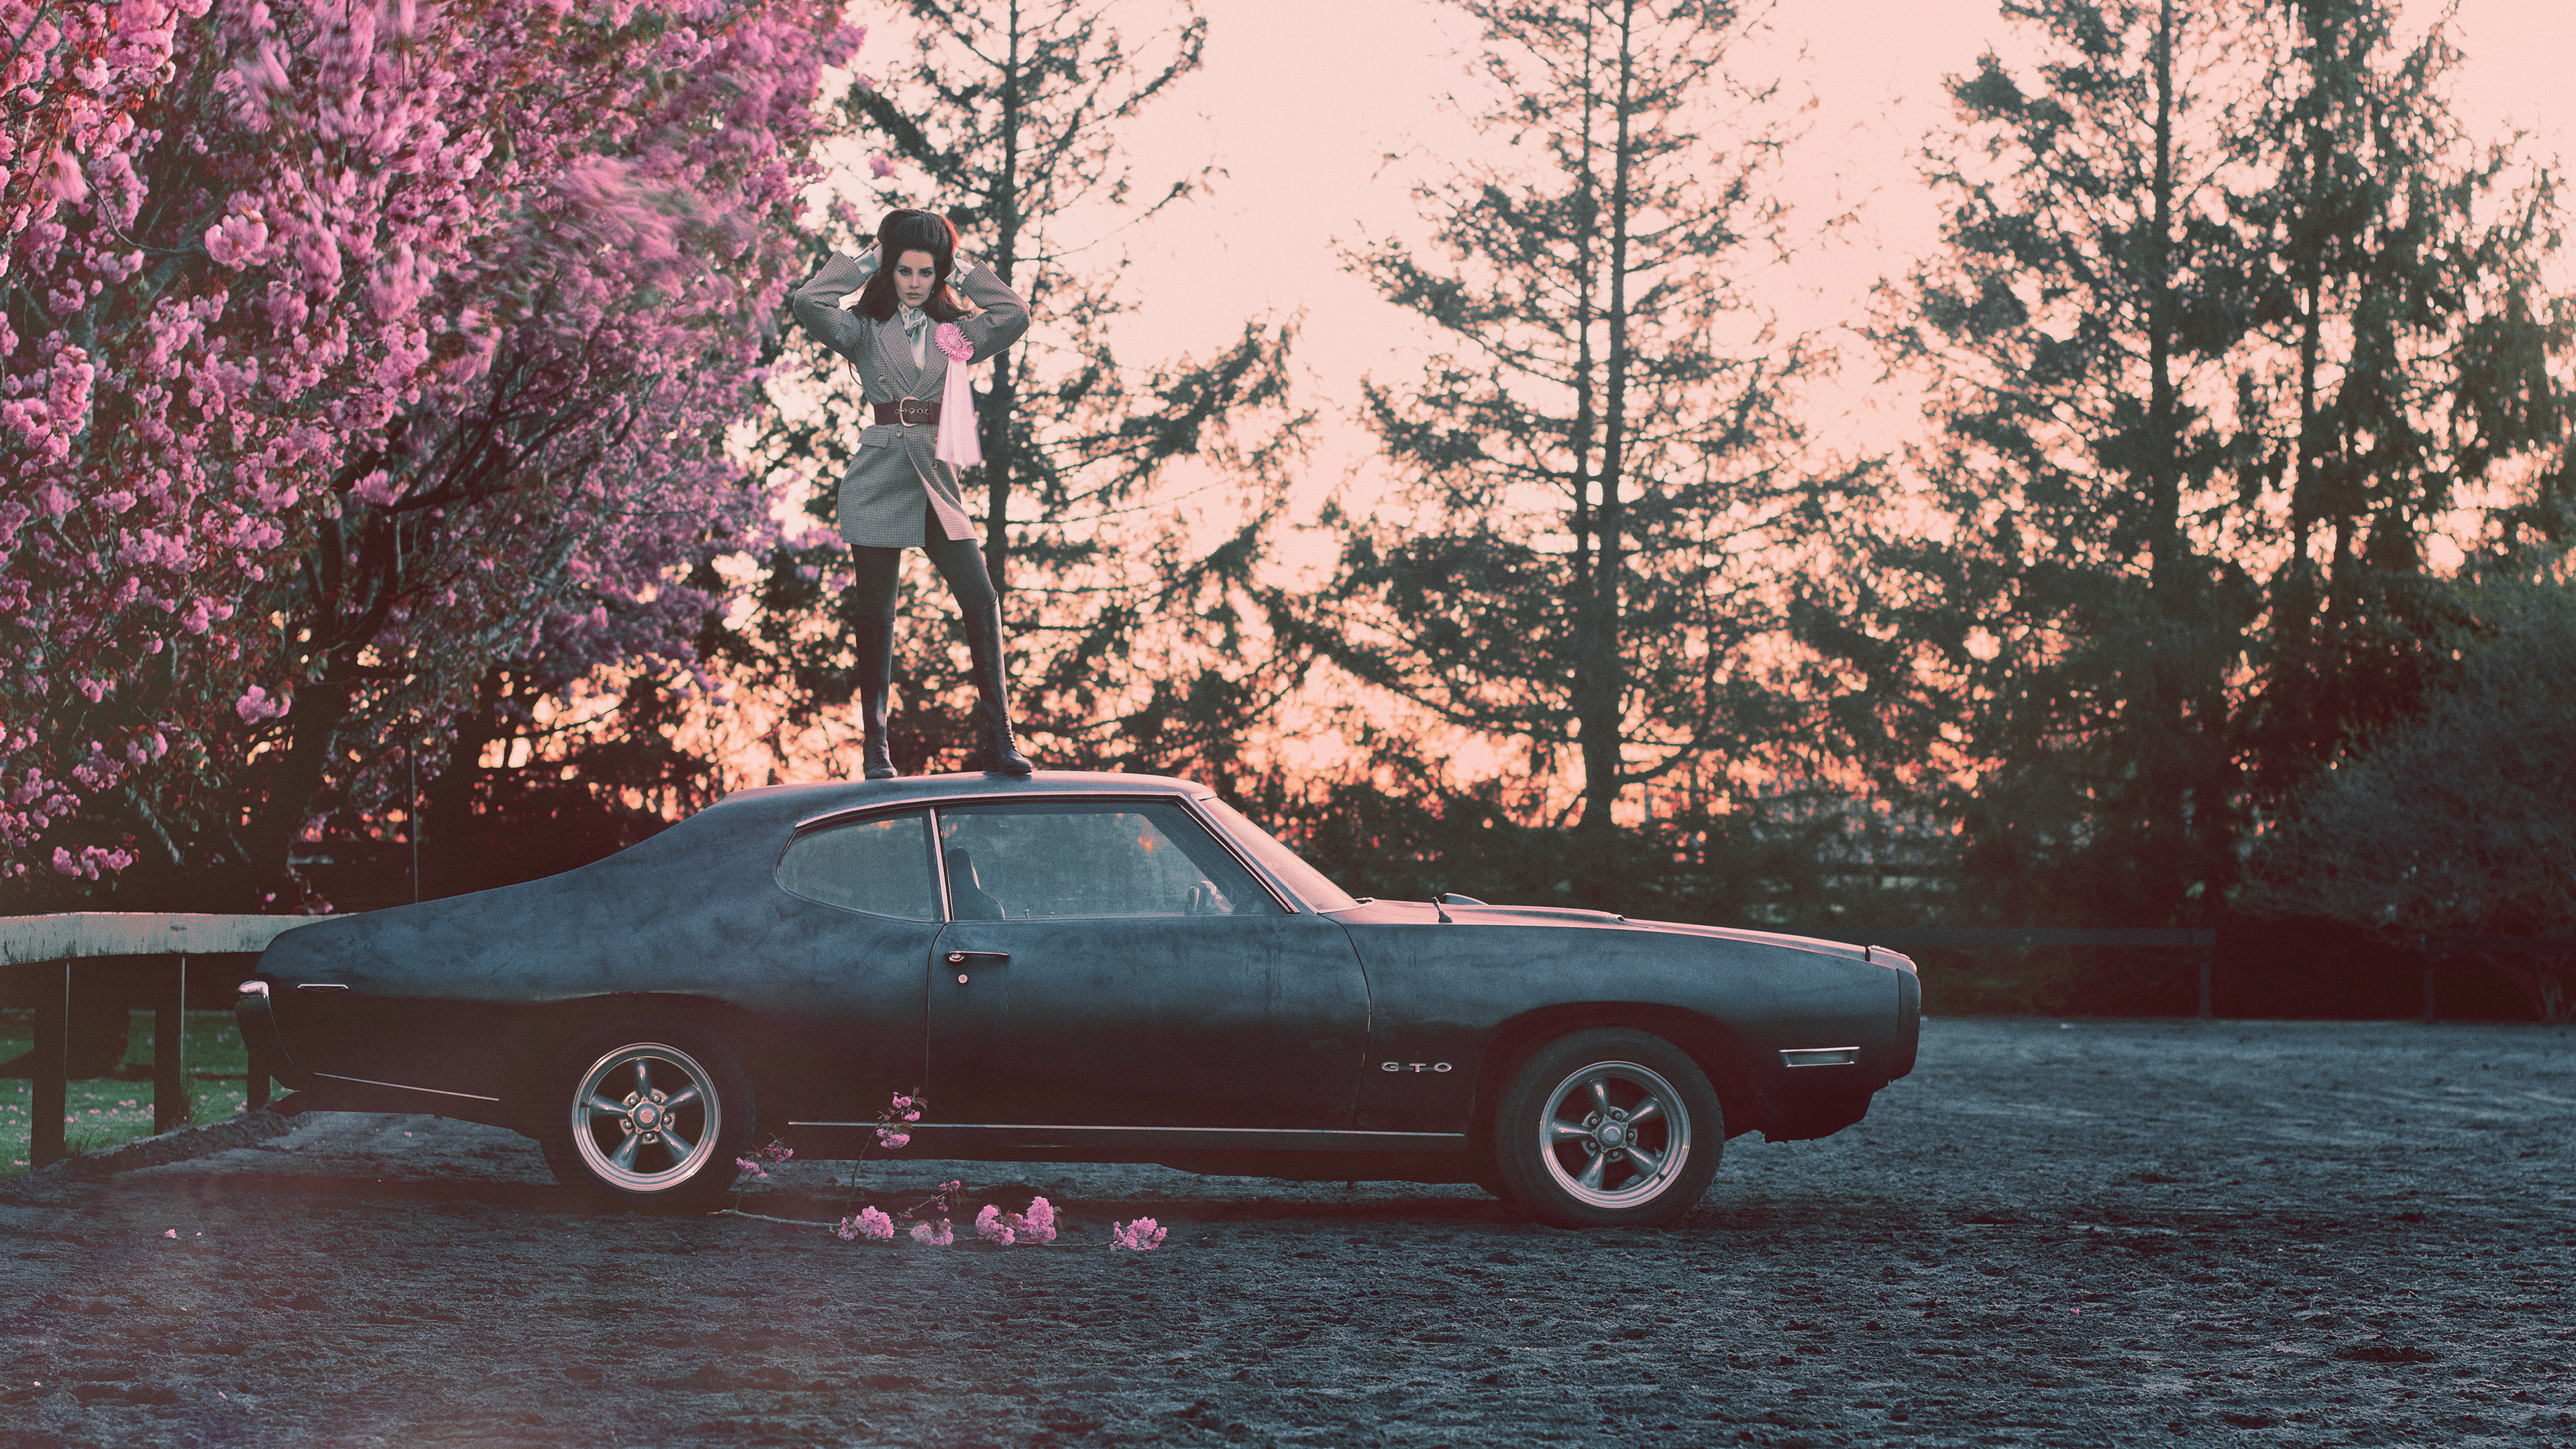 lana del rey 2019 1536950208 - Lana Del Rey 2019 - singer wallpapers, music wallpapers, lana del rey wallpapers, hd-wallpapers, girls wallpapers, celebrities wallpapers, 5k wallpapers, 4k-wallpapers